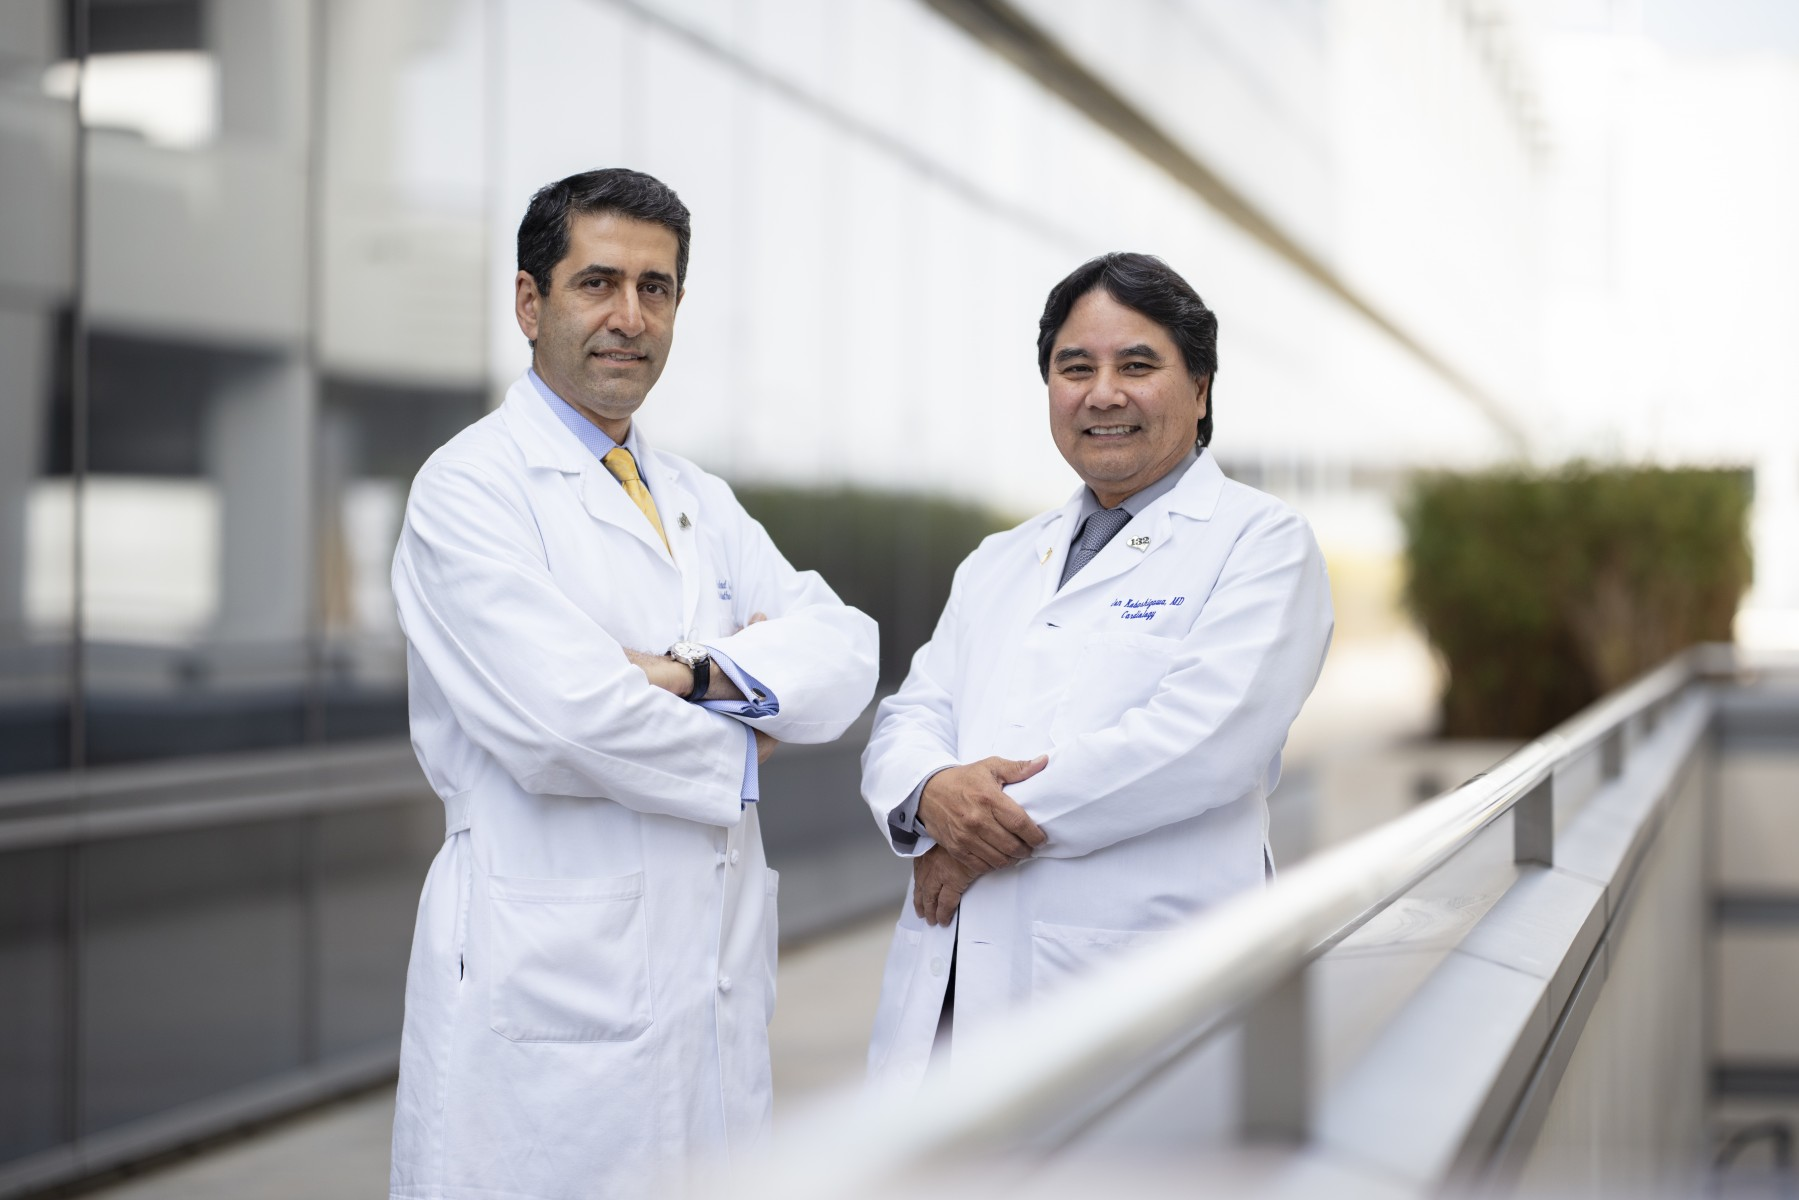 Cedars-Sinai Again Ranked No  1 in 2018 Adult Heart Transplants